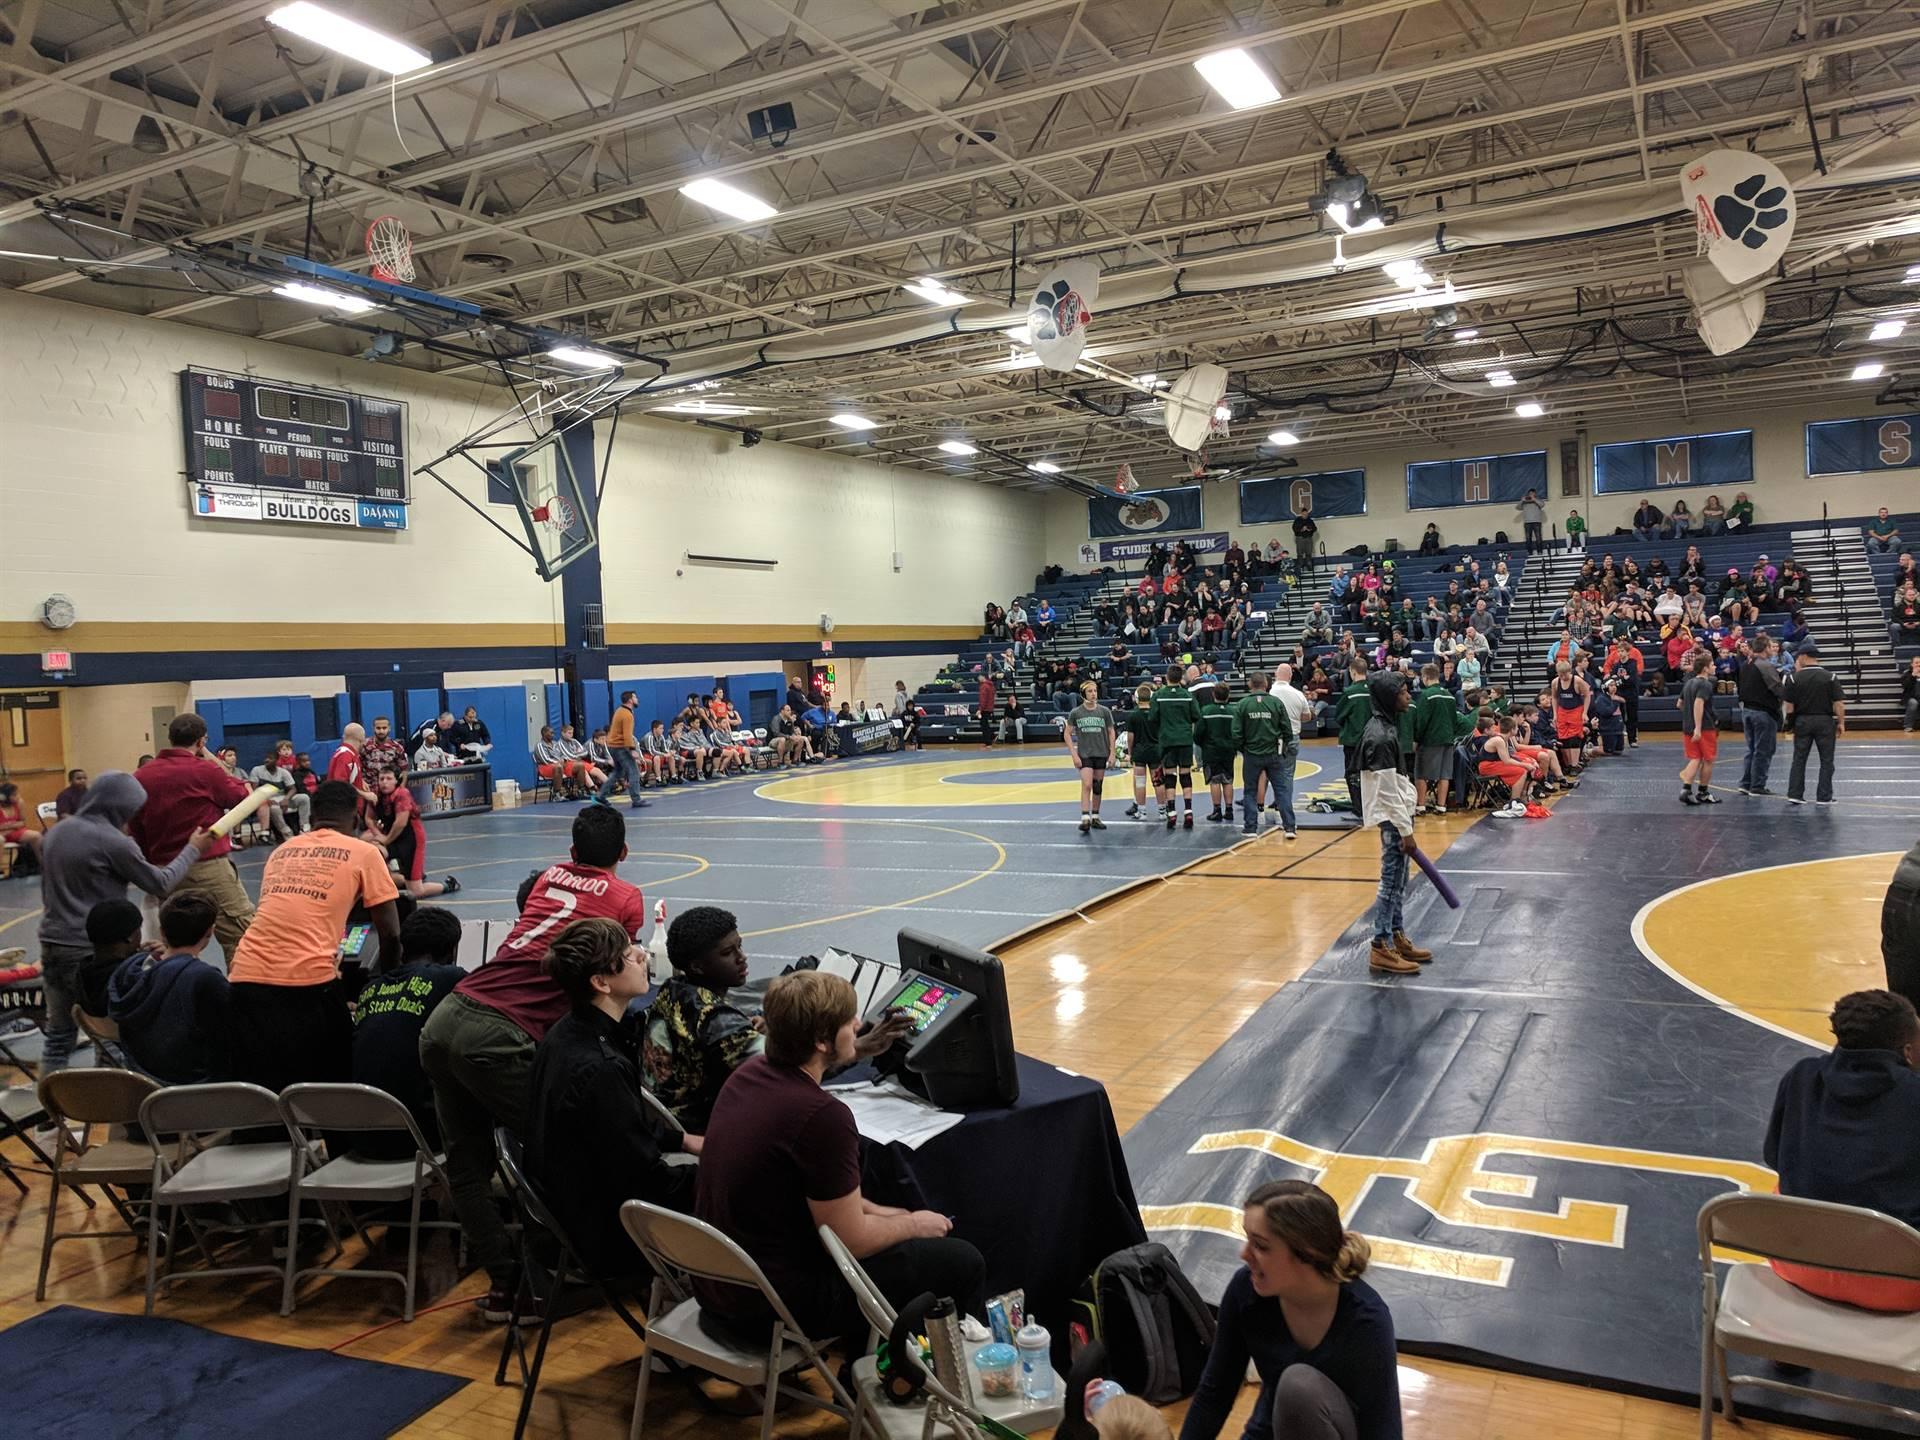 wrestling teams on the floor